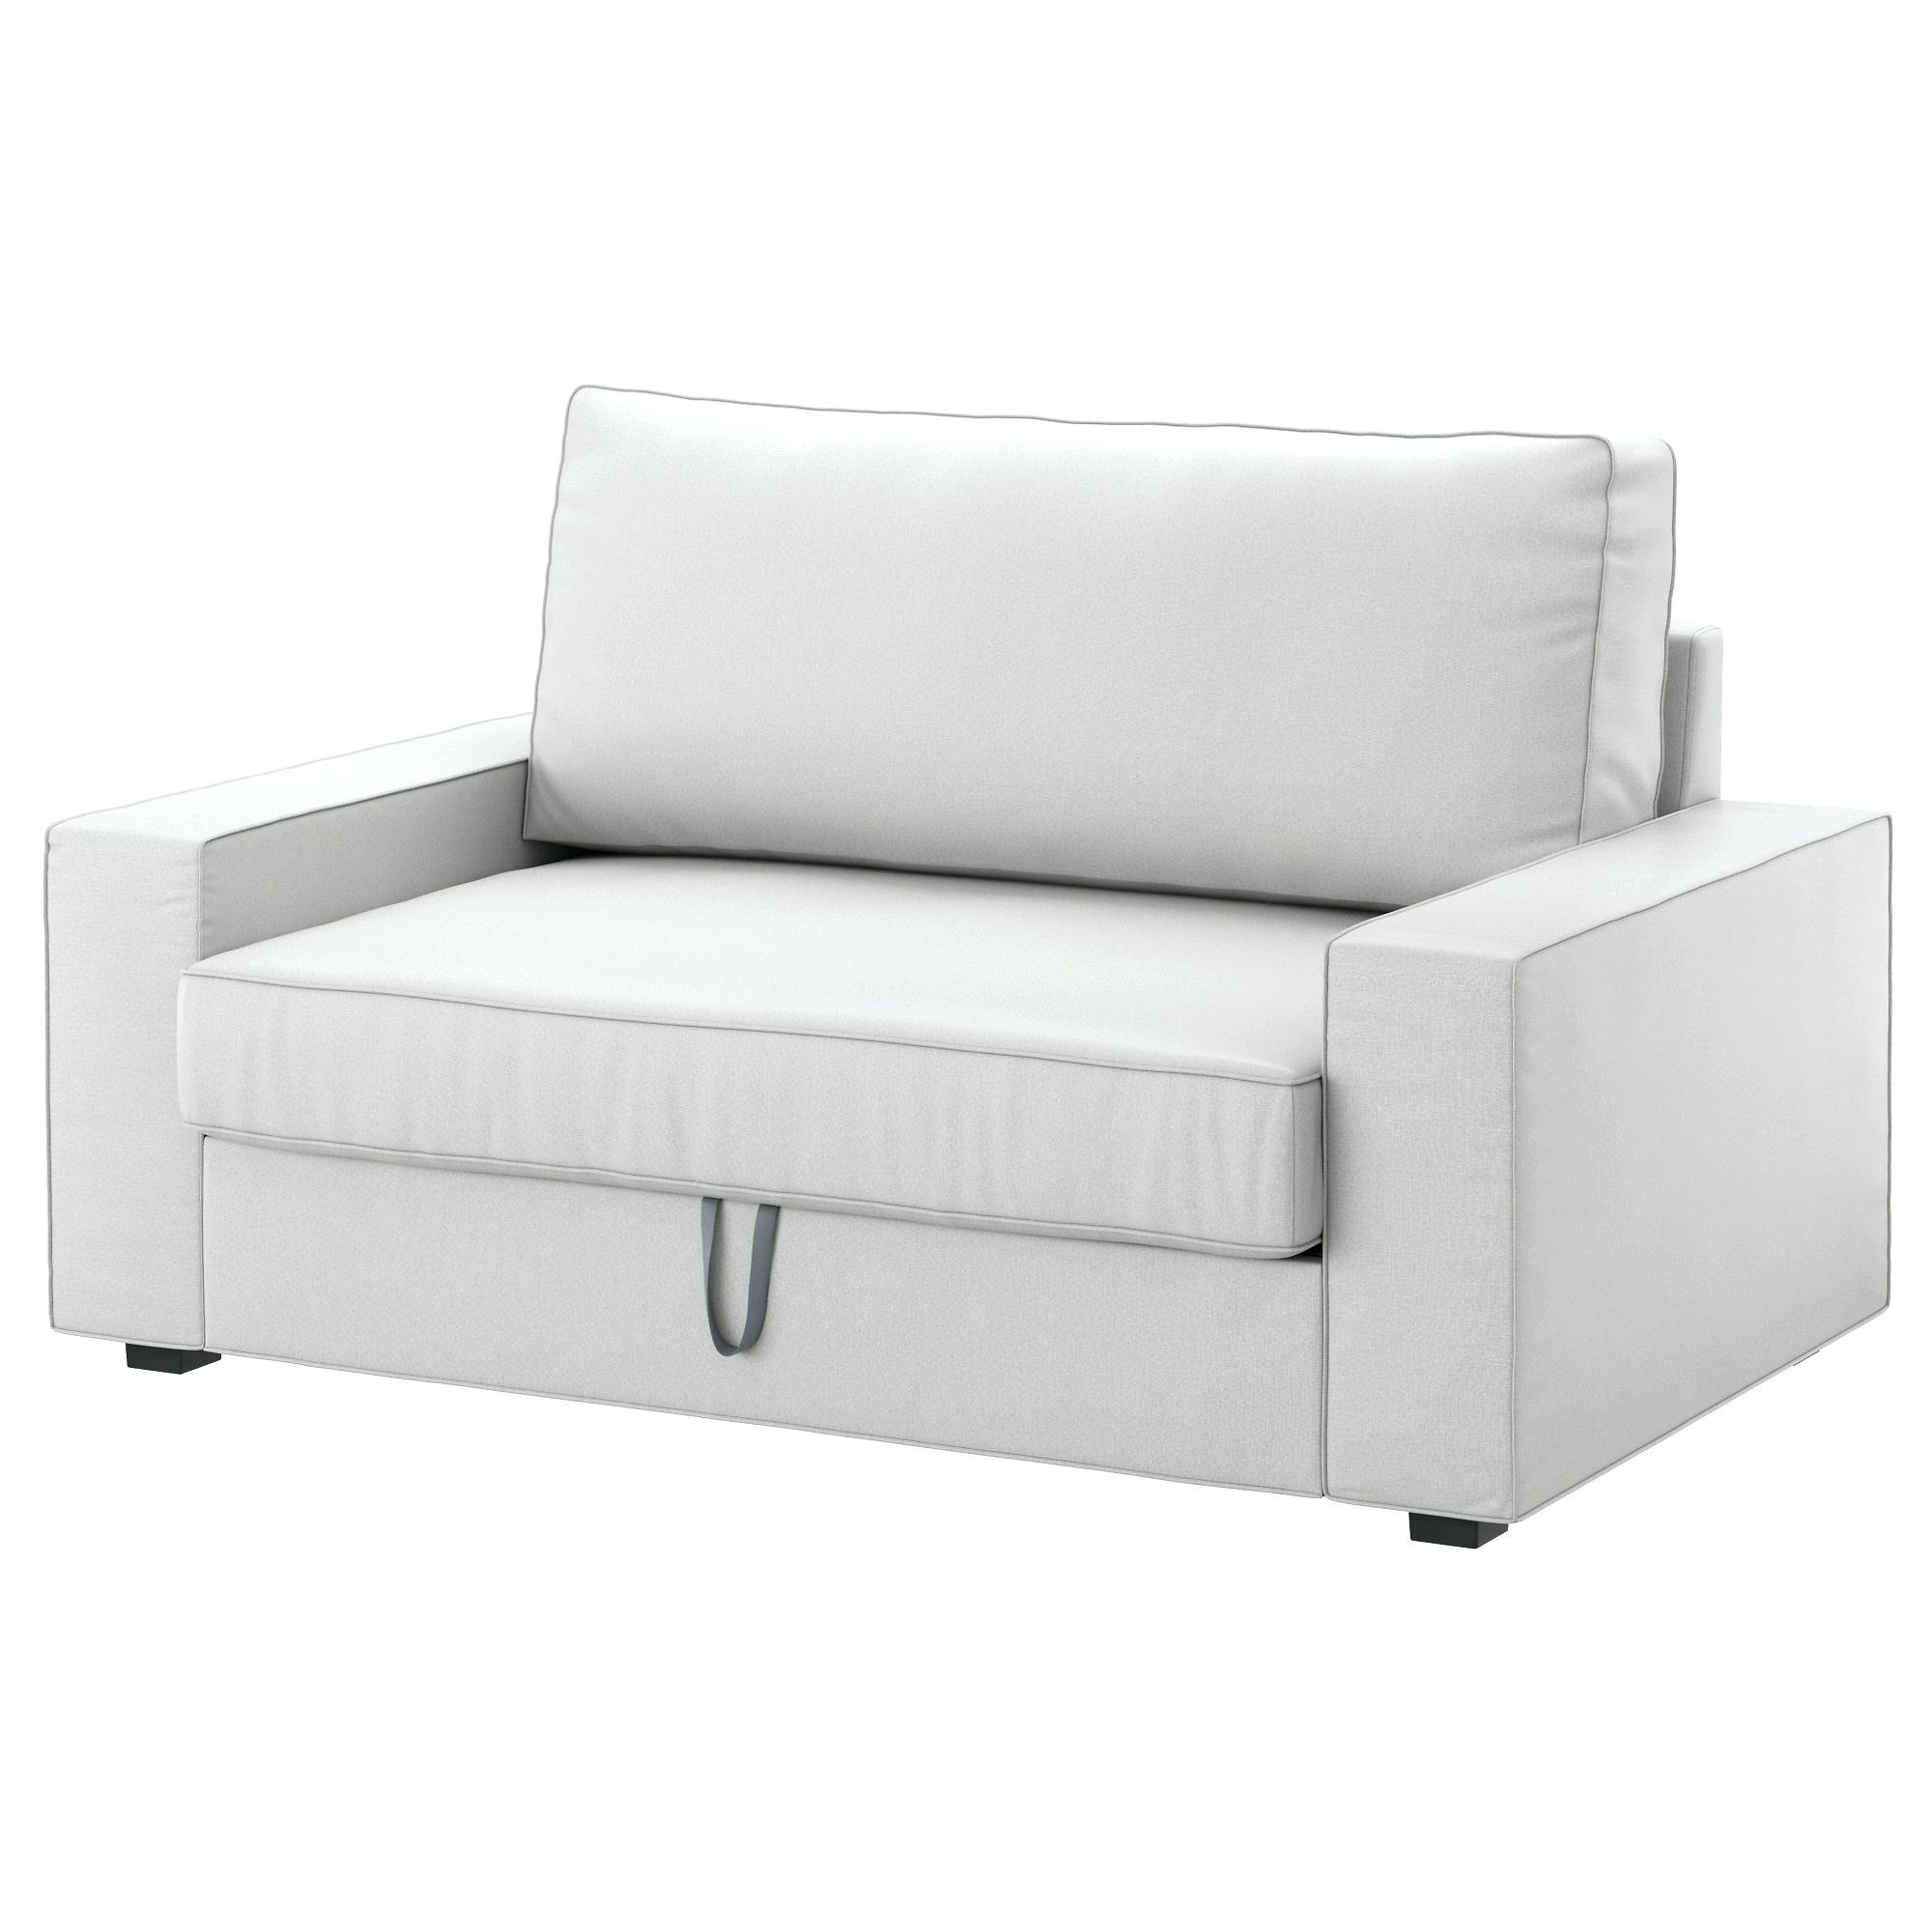 Ikea Housse Ektorp Meilleur De Photos Ikea Housse Bz Luxe Canape Ikea Ektorp] 100 Ektorp Sectional